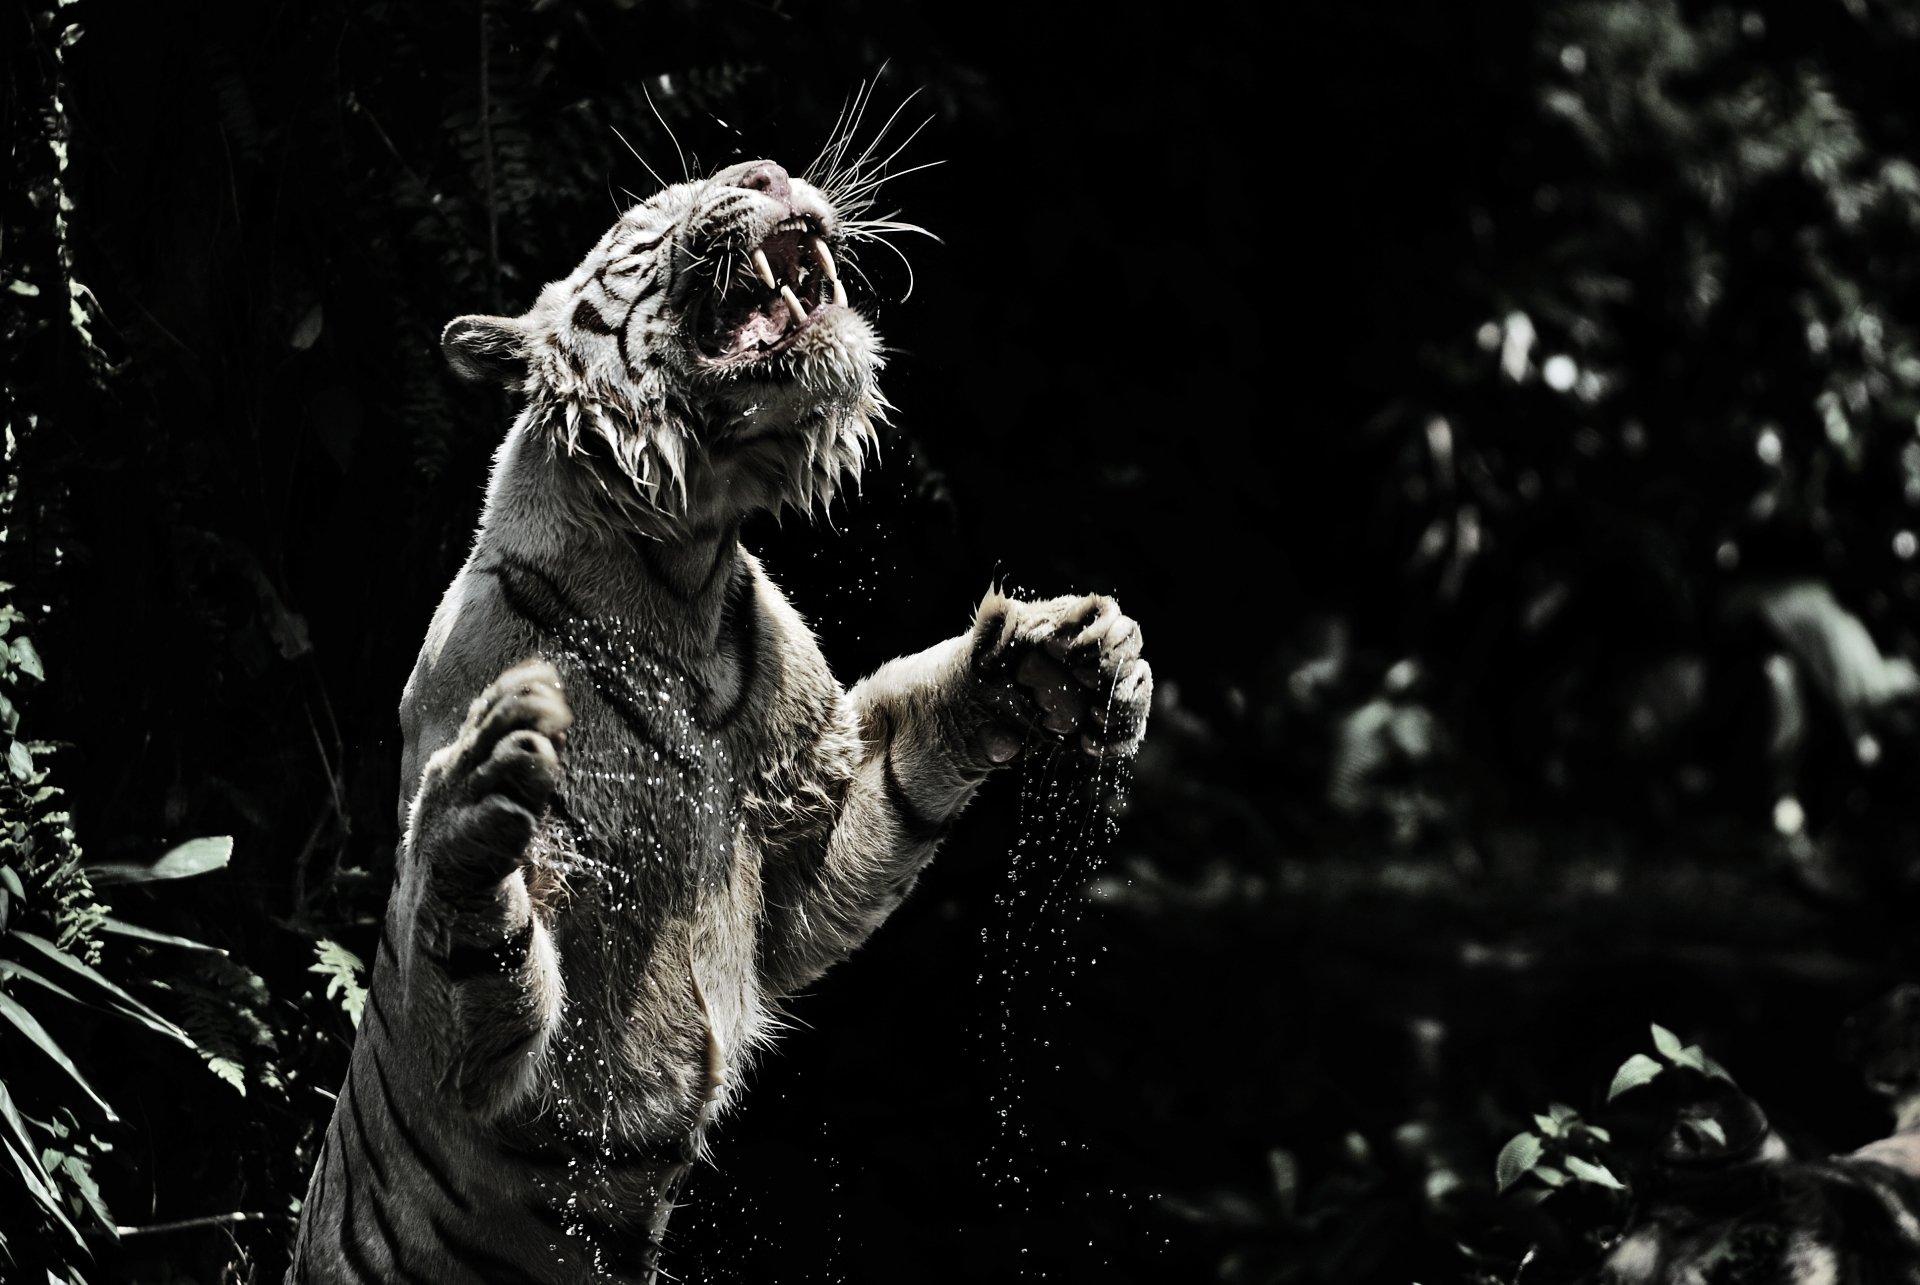 White Tiger 4k Ultra HD Wallpaper | Background Image ...